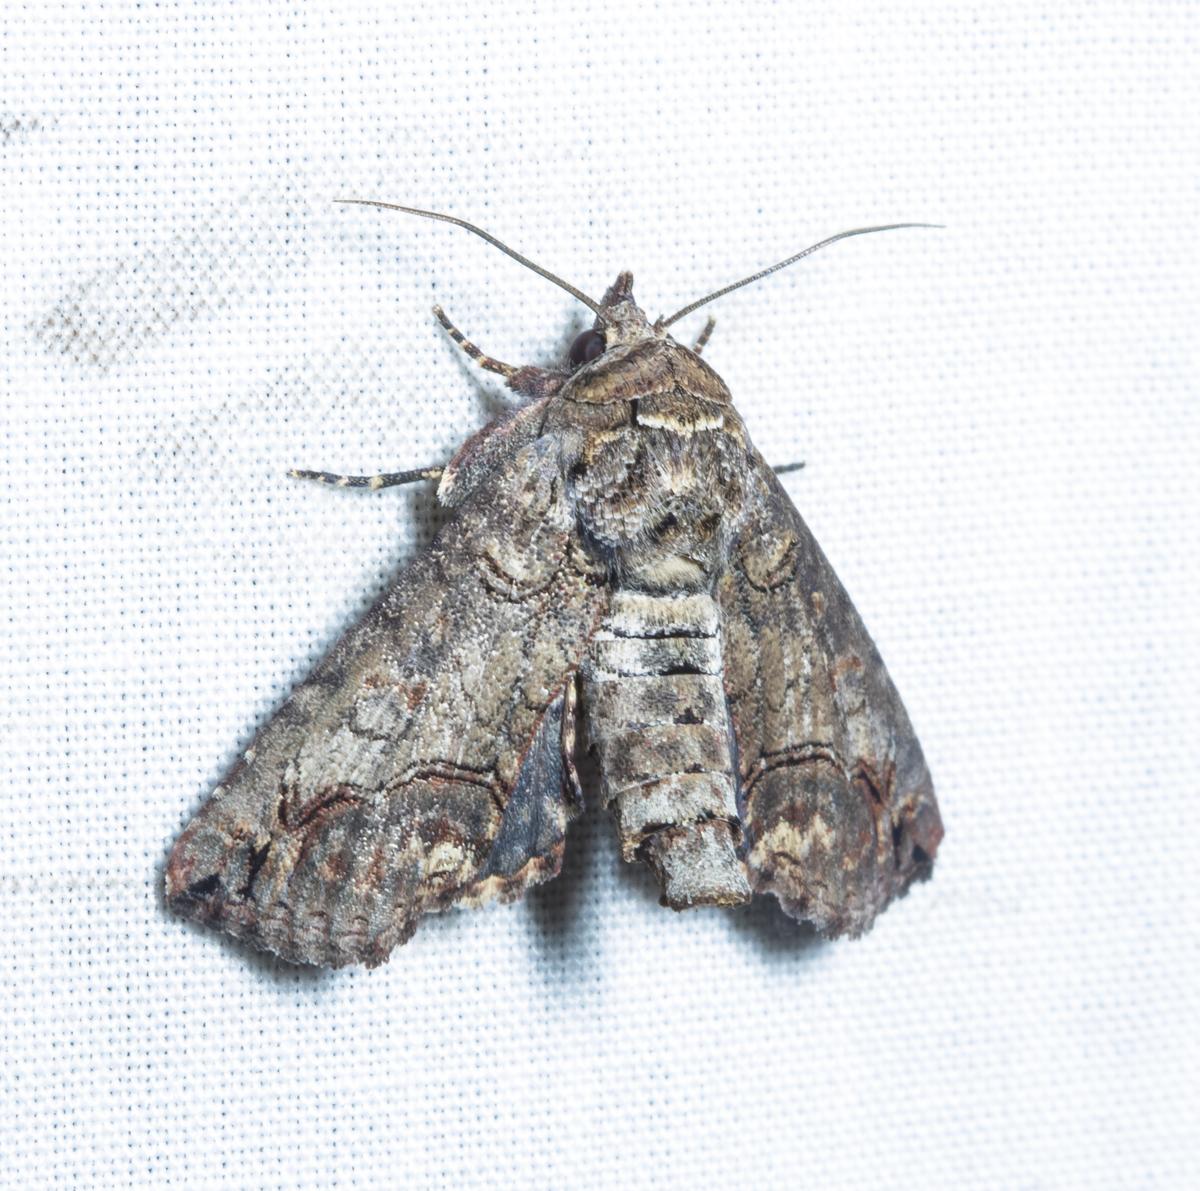 Large Paectes Moth, paectes abrostoloides